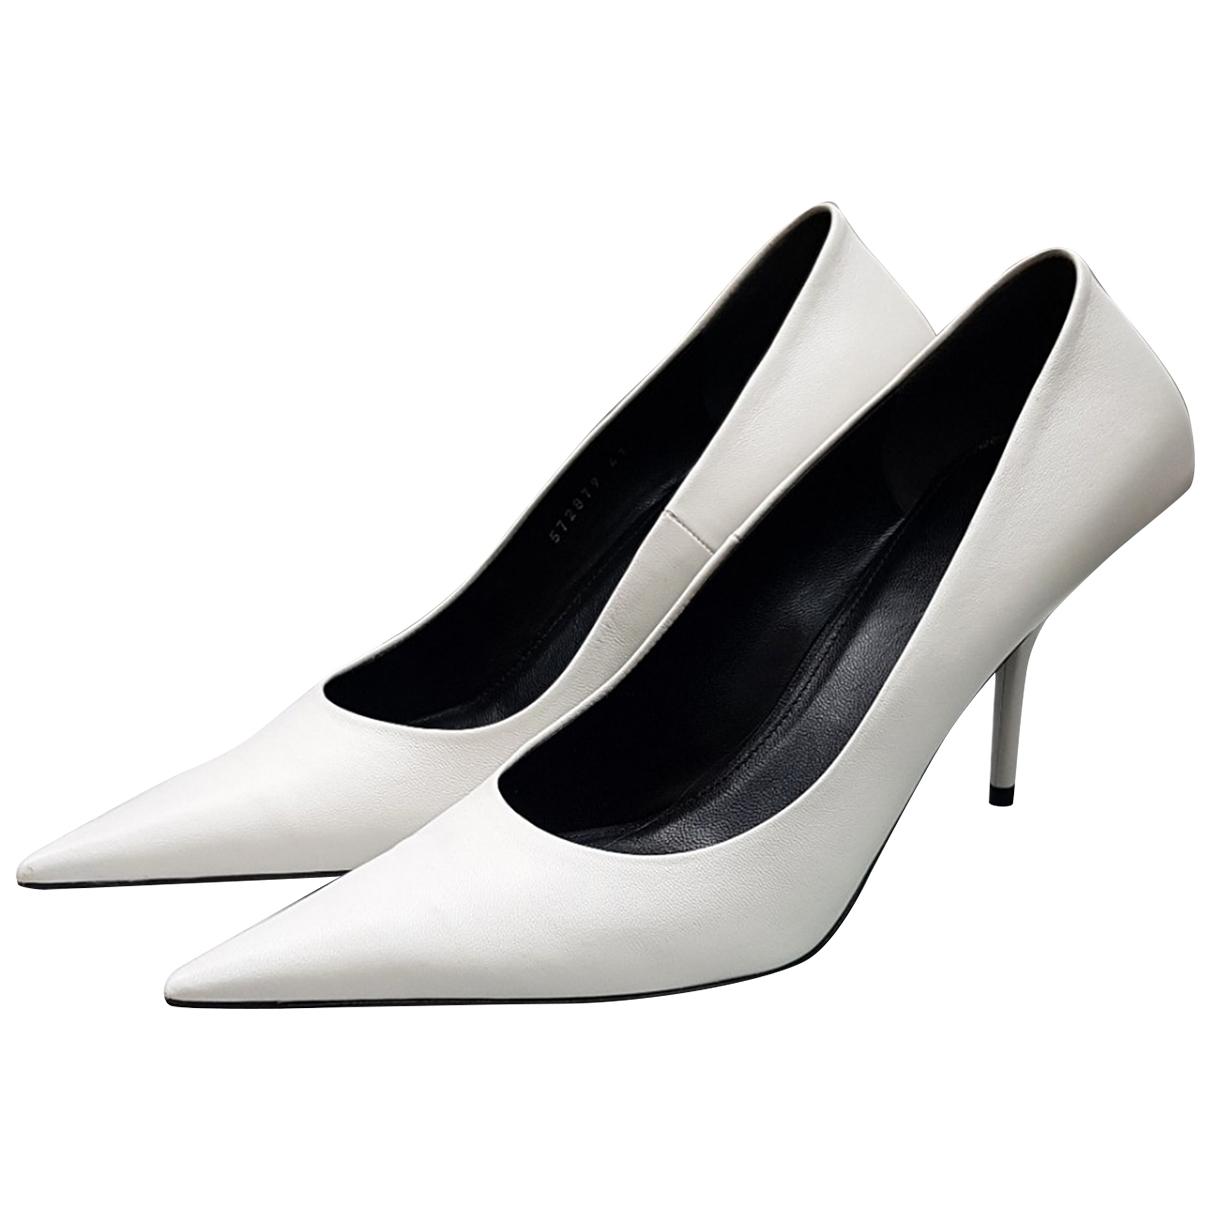 Balenciaga \N White Leather Heels for Women 41 EU